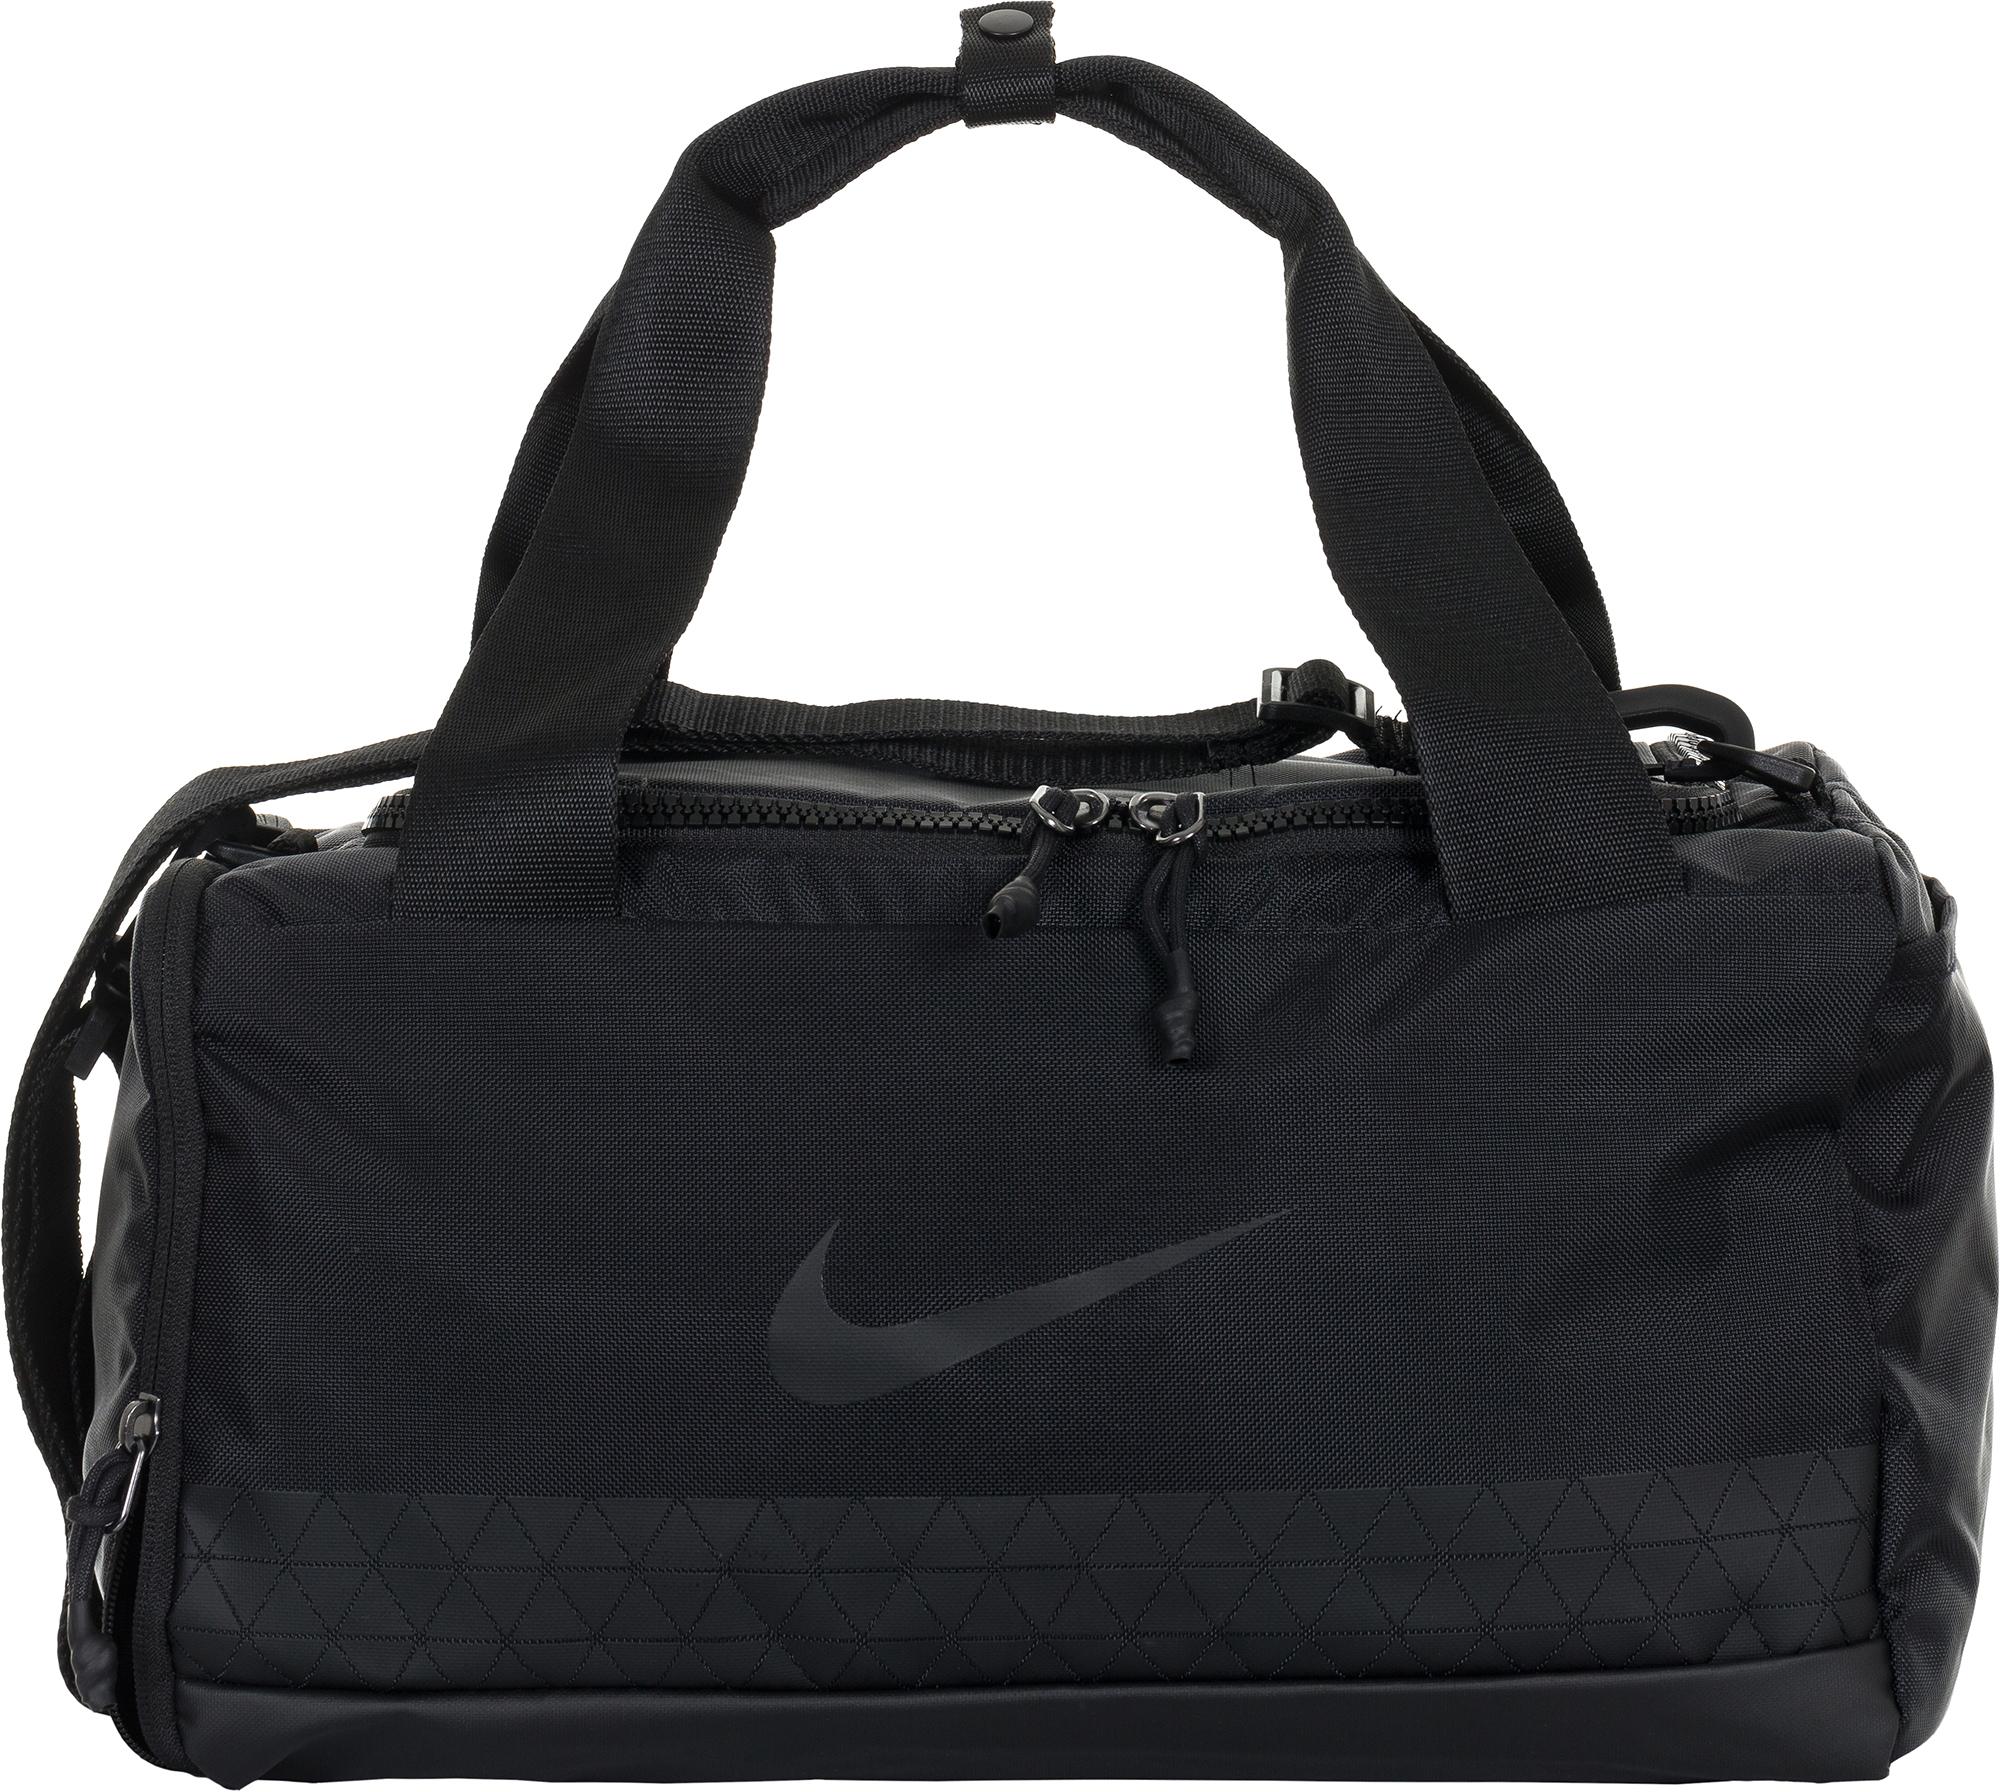 купить Nike Сумка Nike Vapor Jet Drum дешево